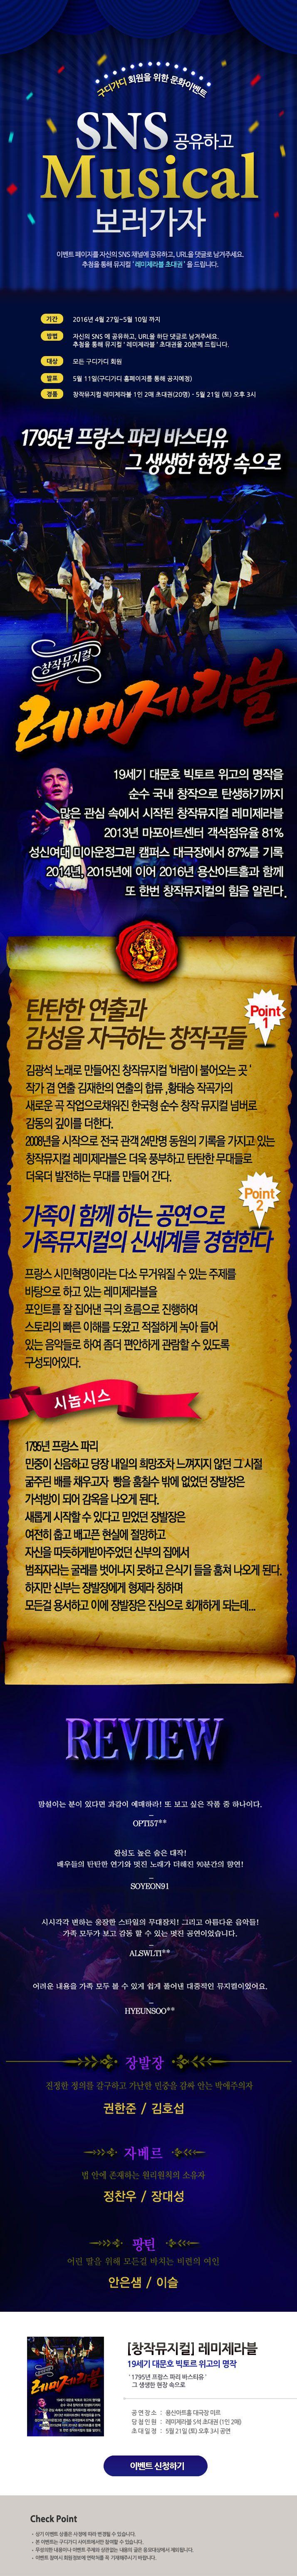 SNS 공유하고 뮤지컬 보러가자 - 구디가디>이벤트>이벤트